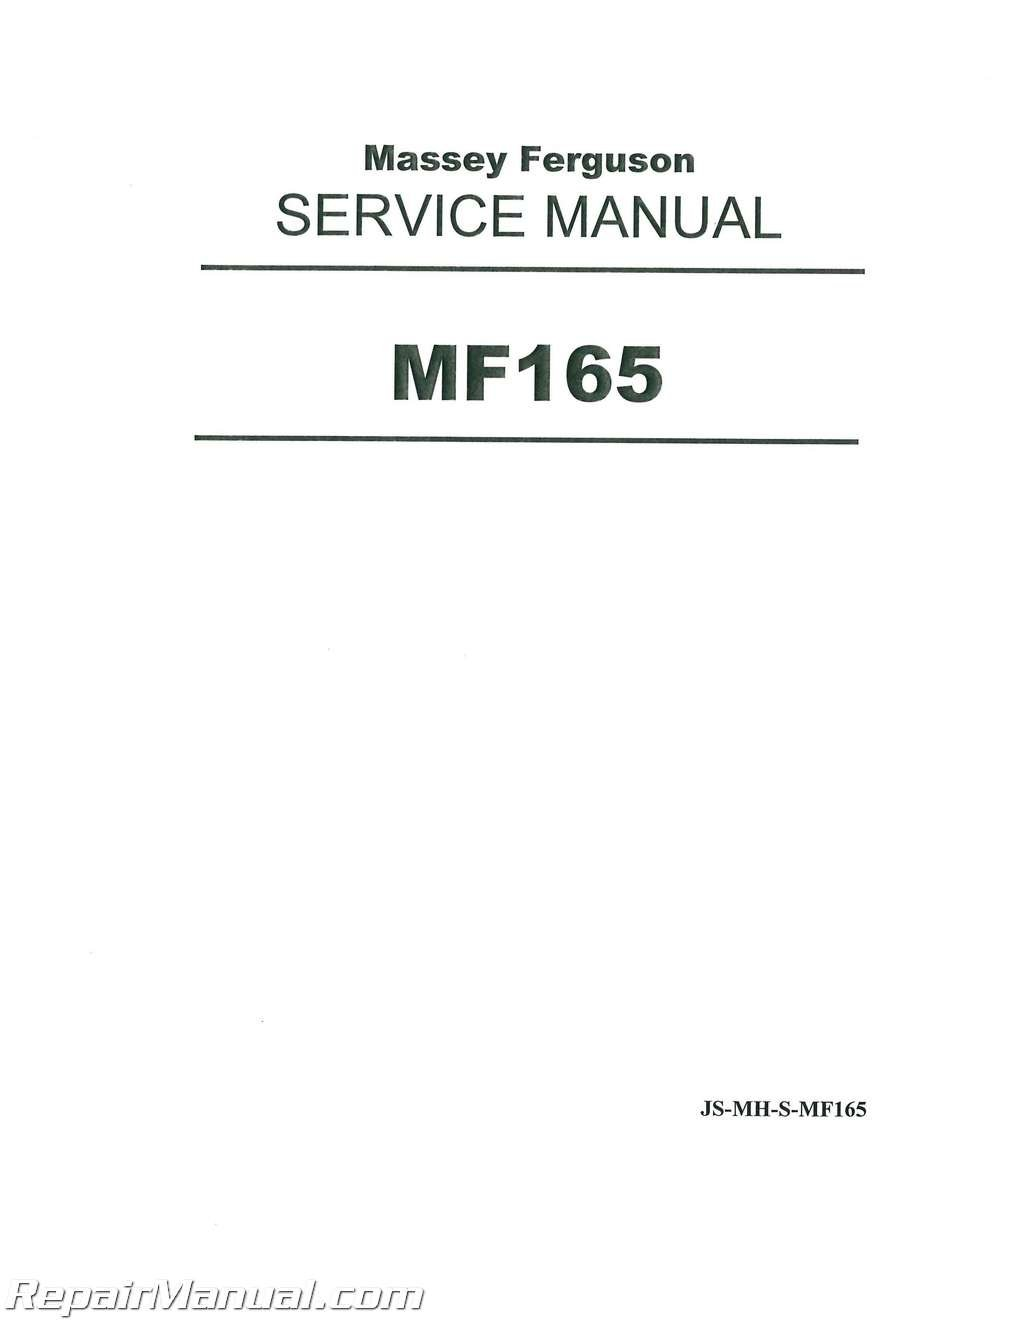 JS-MH-S-MF165 Massey Ferguson MF150 MF165 MF175 MF180 Service Manual:  Manufacturer: Amazon.com: Books